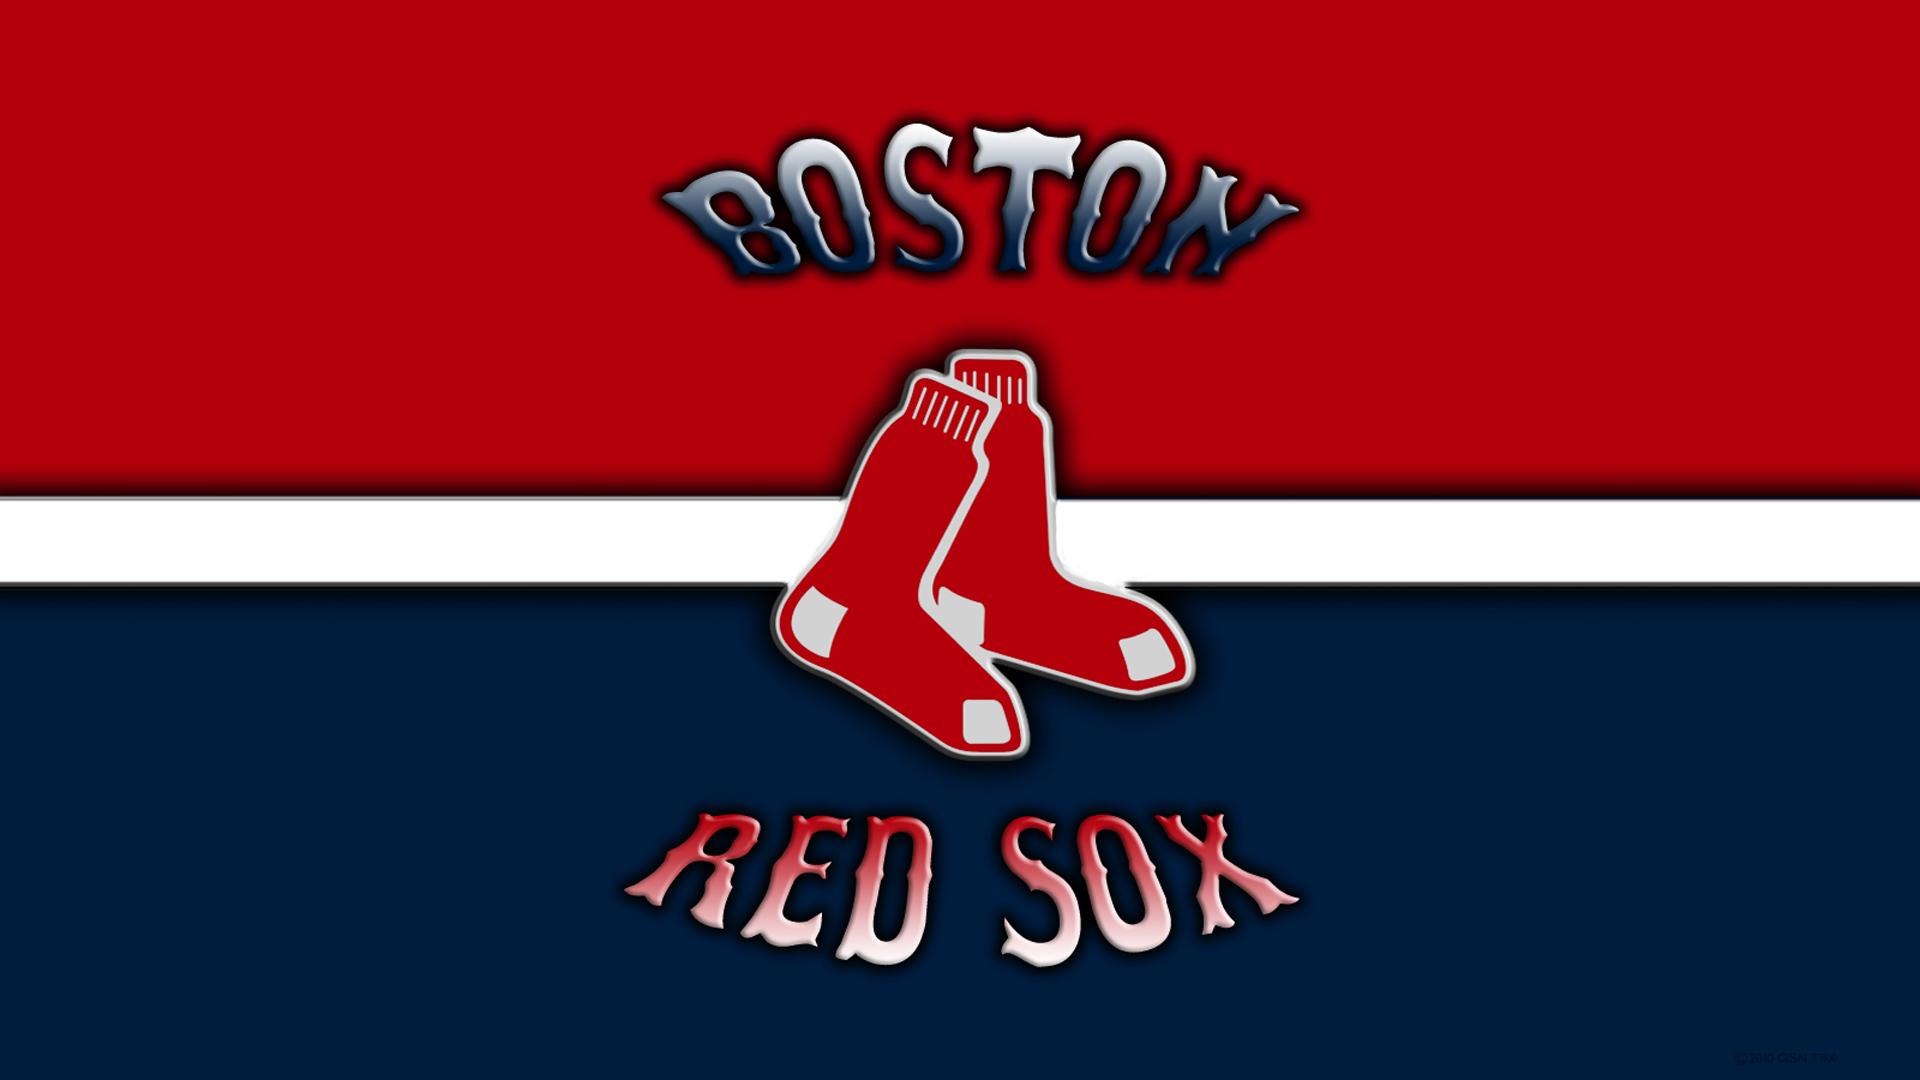 BOSTON RED SOX baseball mlb g wallpaper 1920x1080 158162 1920x1080